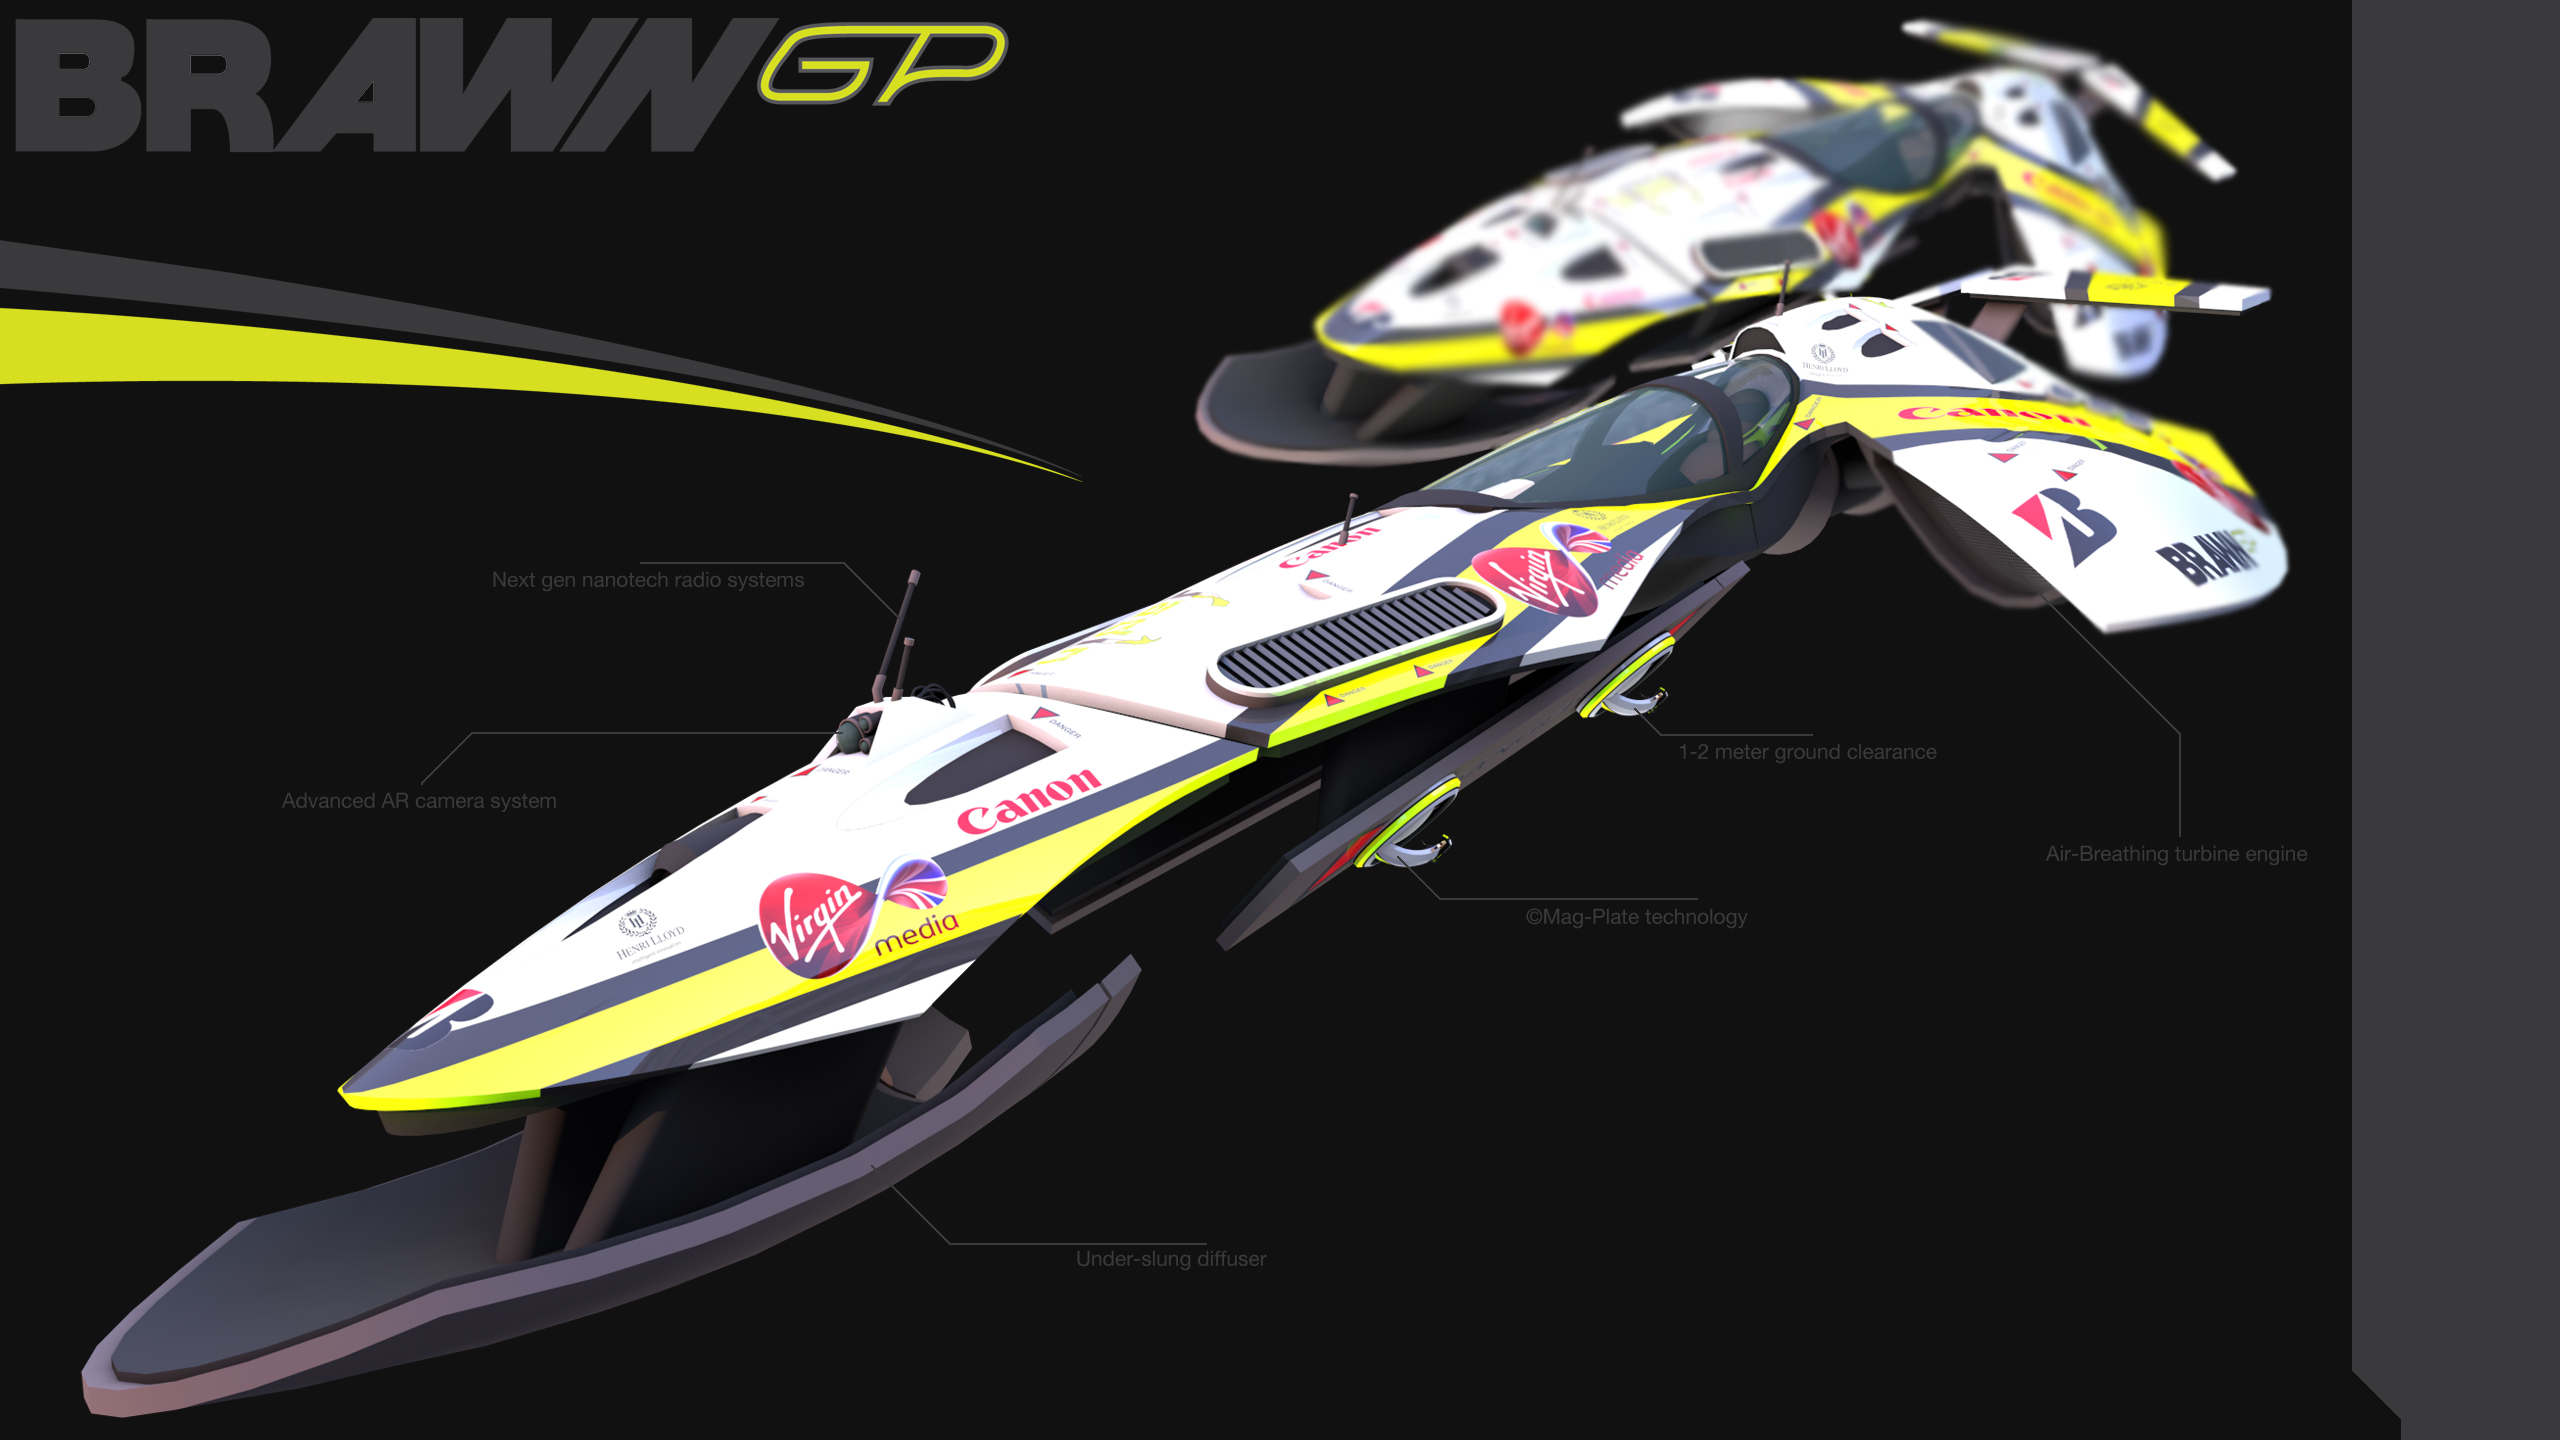 Brawn GP 2015 viper Formula 1 craft by minimacman15 2560x1440